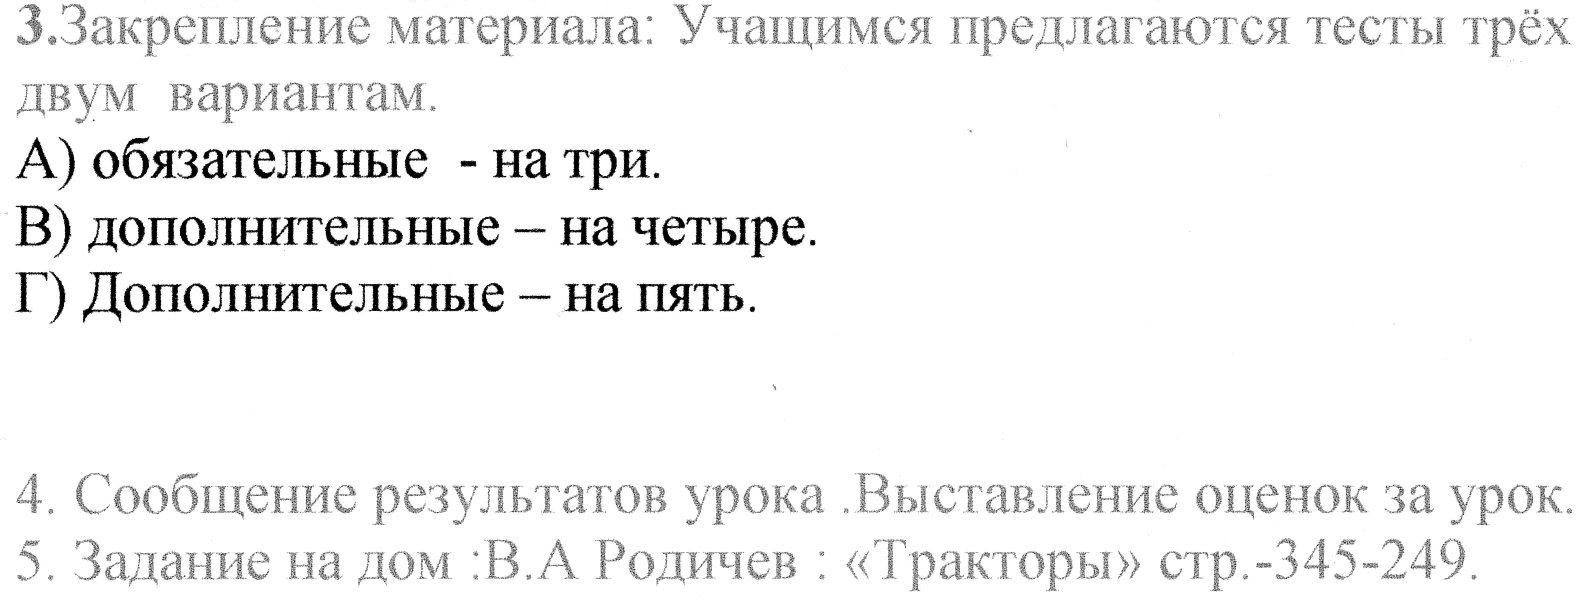 C:\Users\Василий Мельченко\Pictures\img522.jpg